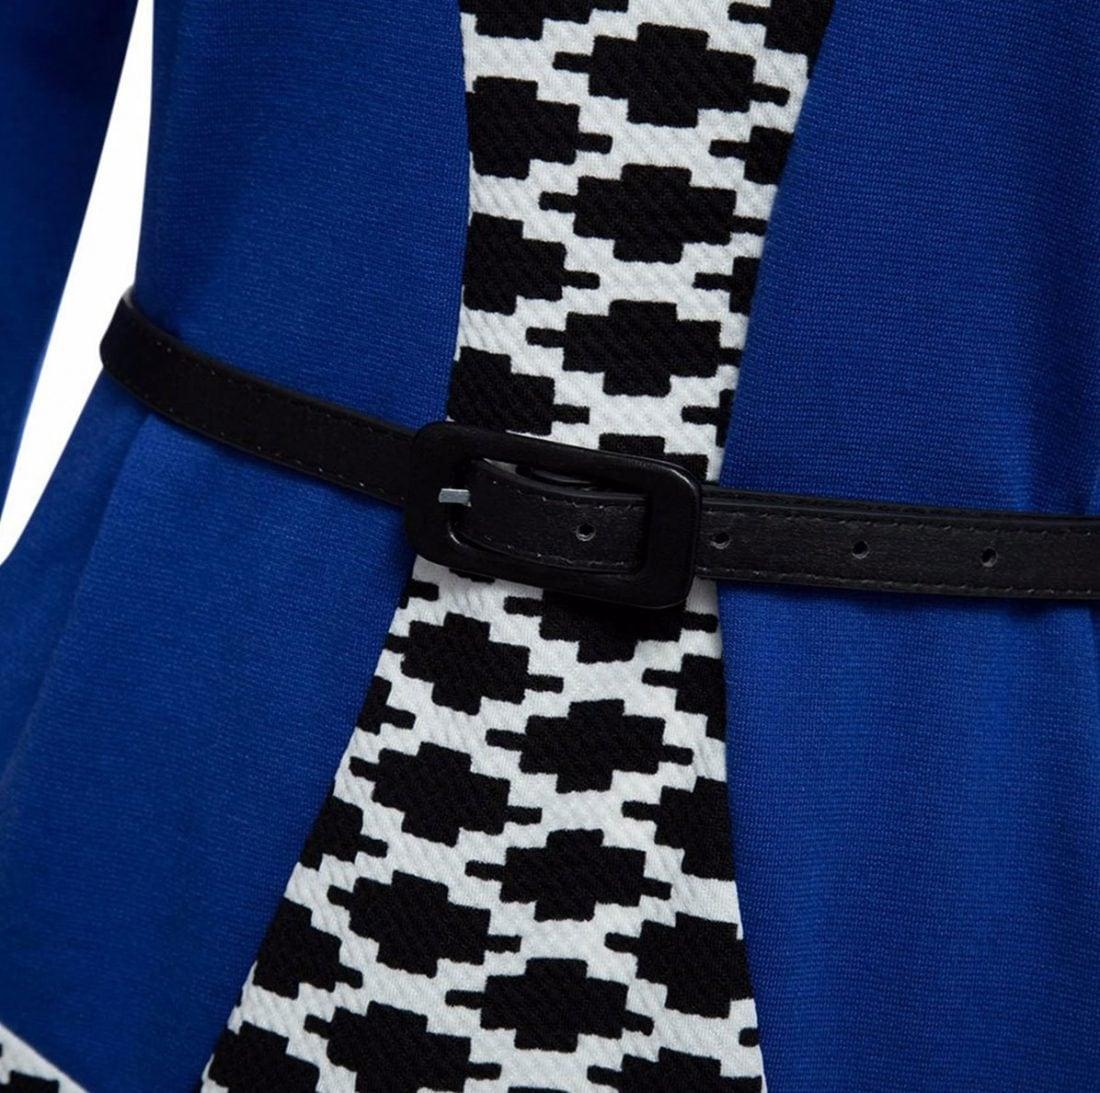 M0187 blueblack3 Office Evening Dresses maureens.com boutique